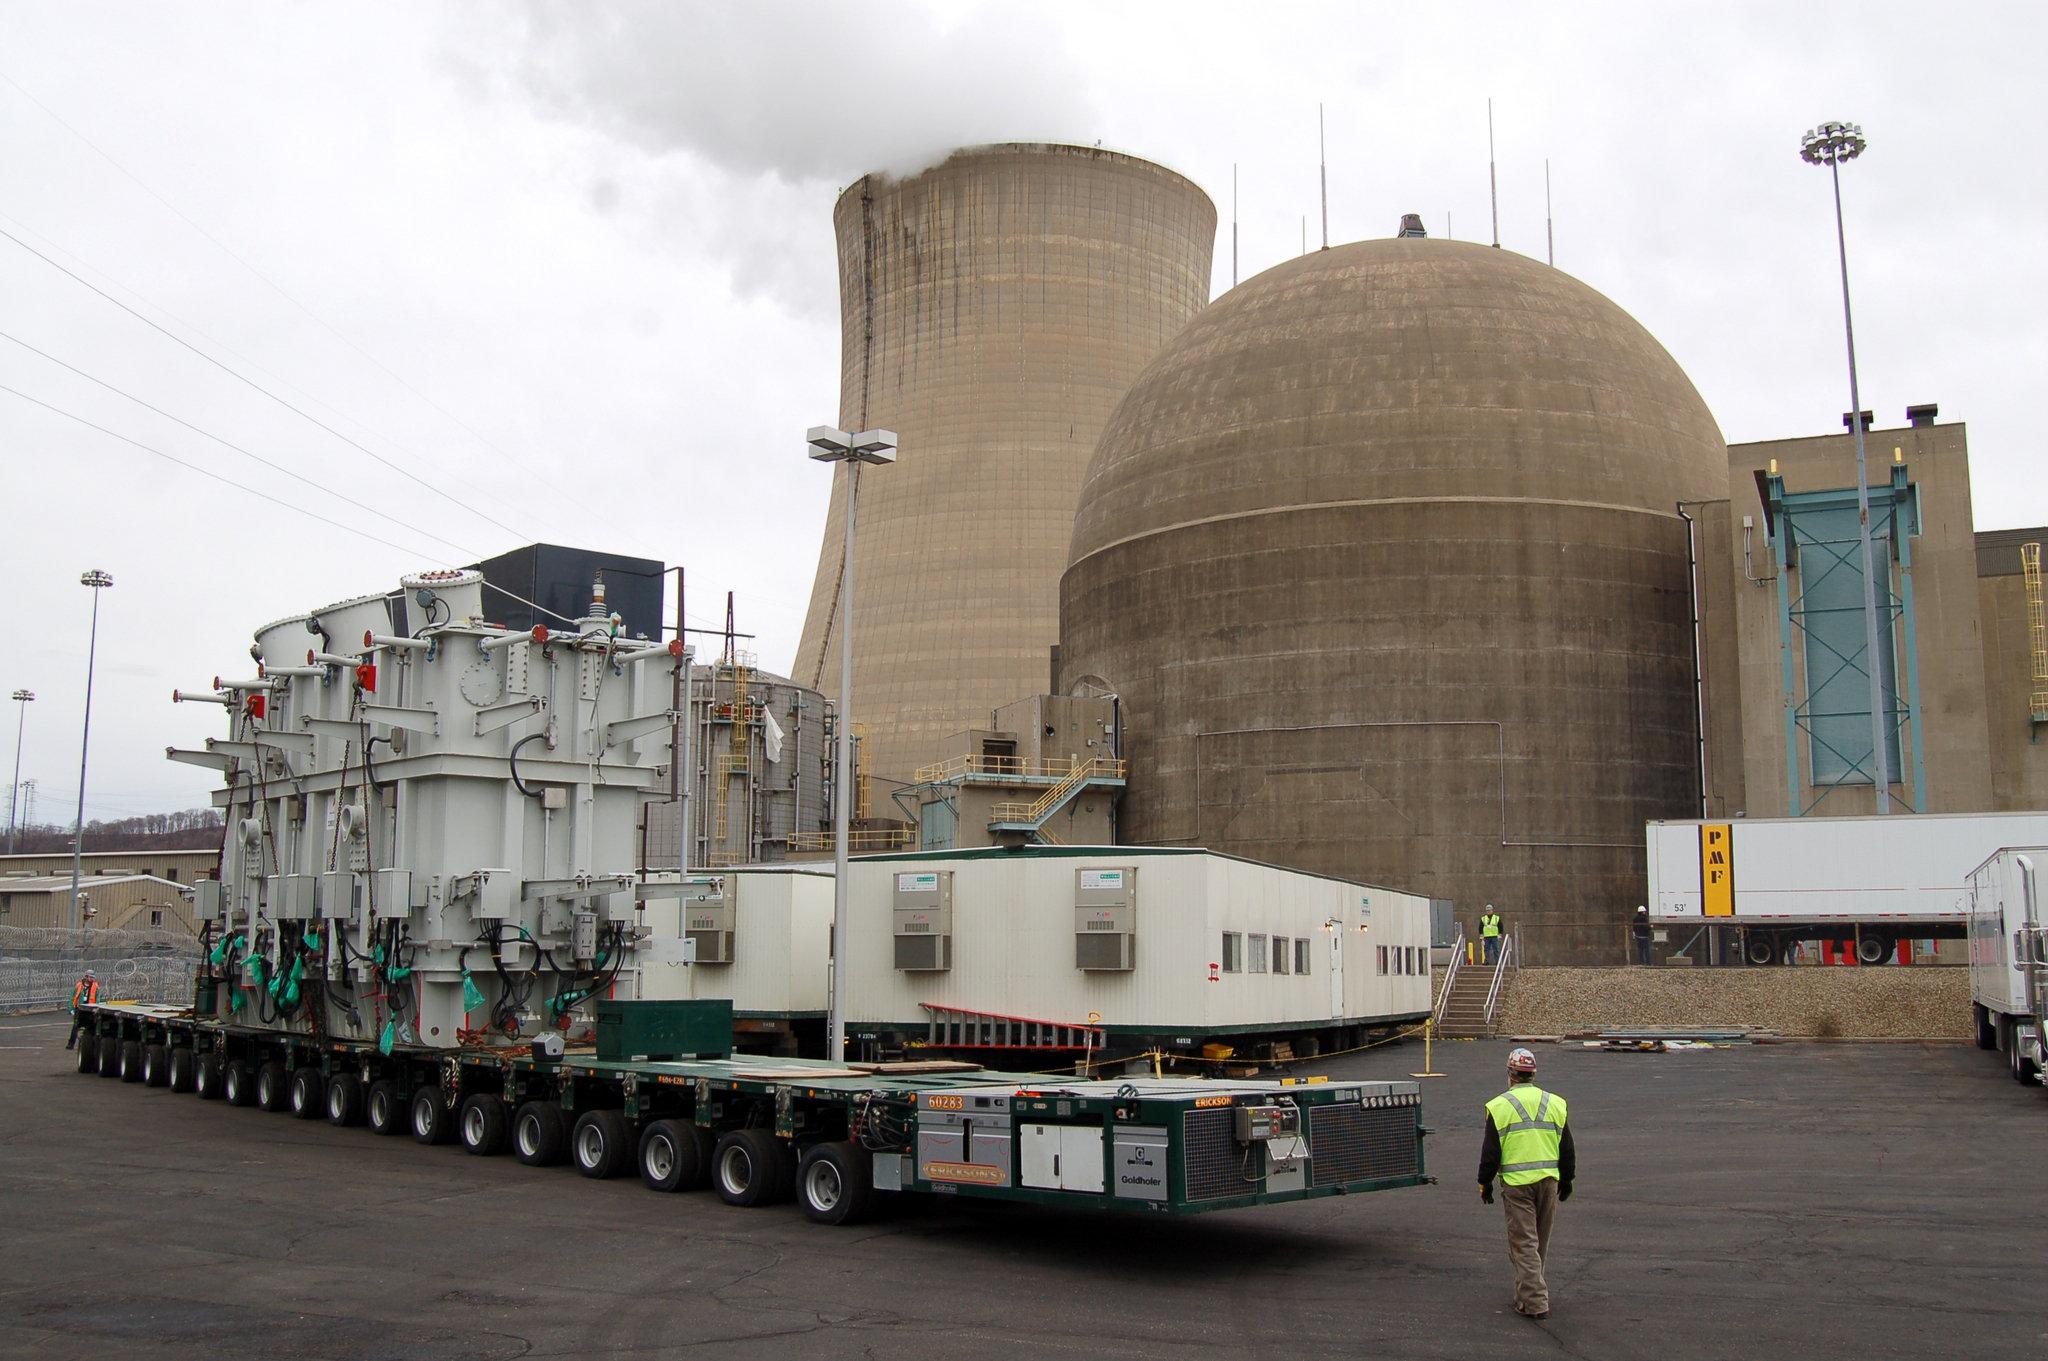 http://media.cleveland.com/business_impact/photo/beaver-valley-nuclear-reactor-transformerjpg-58e2b800d610daab.jpg